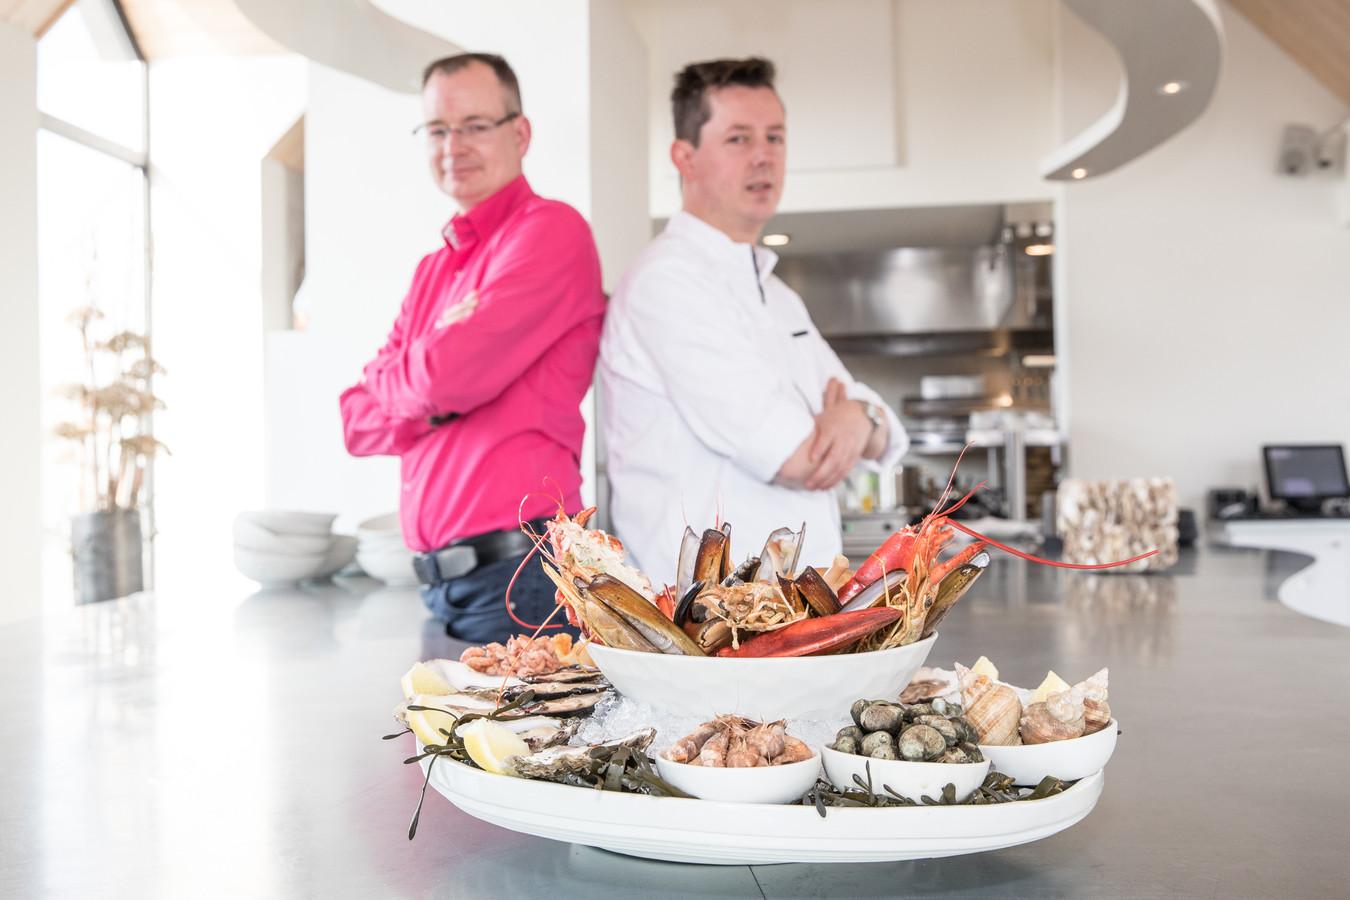 Gastheer Reinier van der Kammen (roze overhemd), chef-kok Edwin Ossewaarde